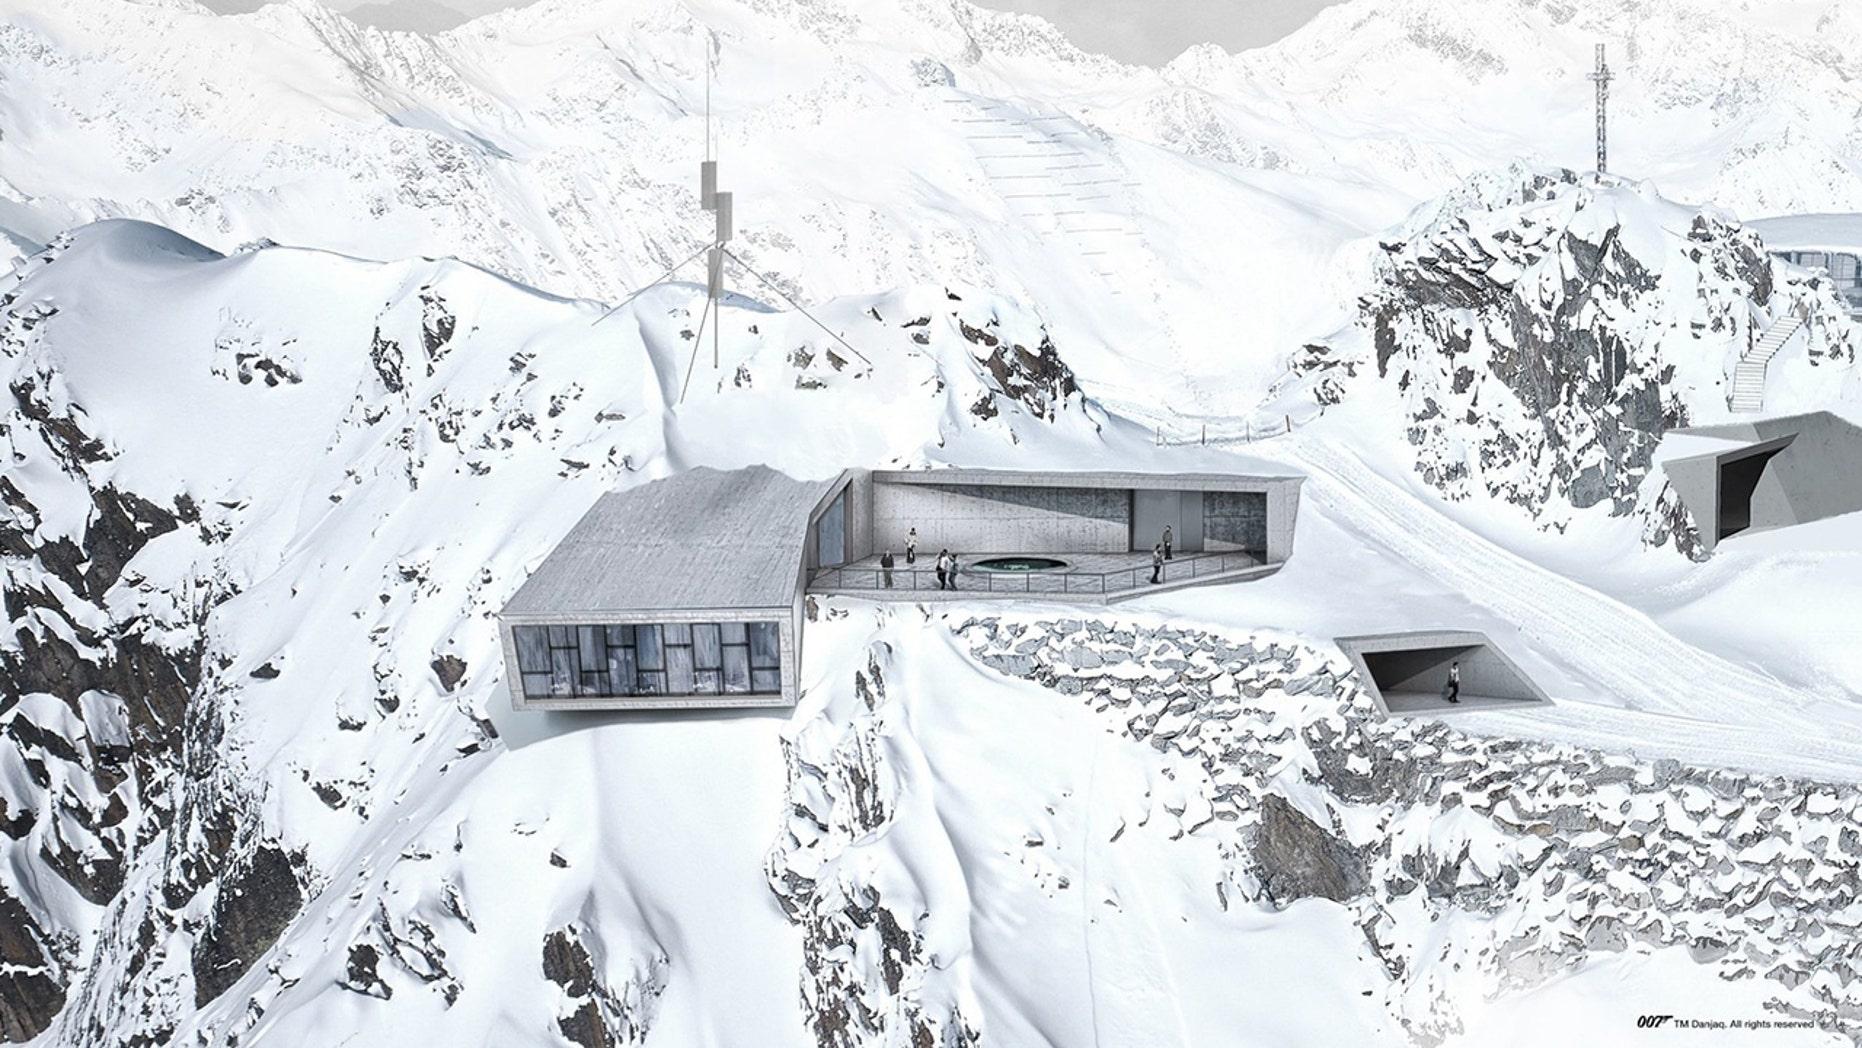 The 007 Elements museum is built inside the summit of the Gaislachkogl Mountain in Sölden.